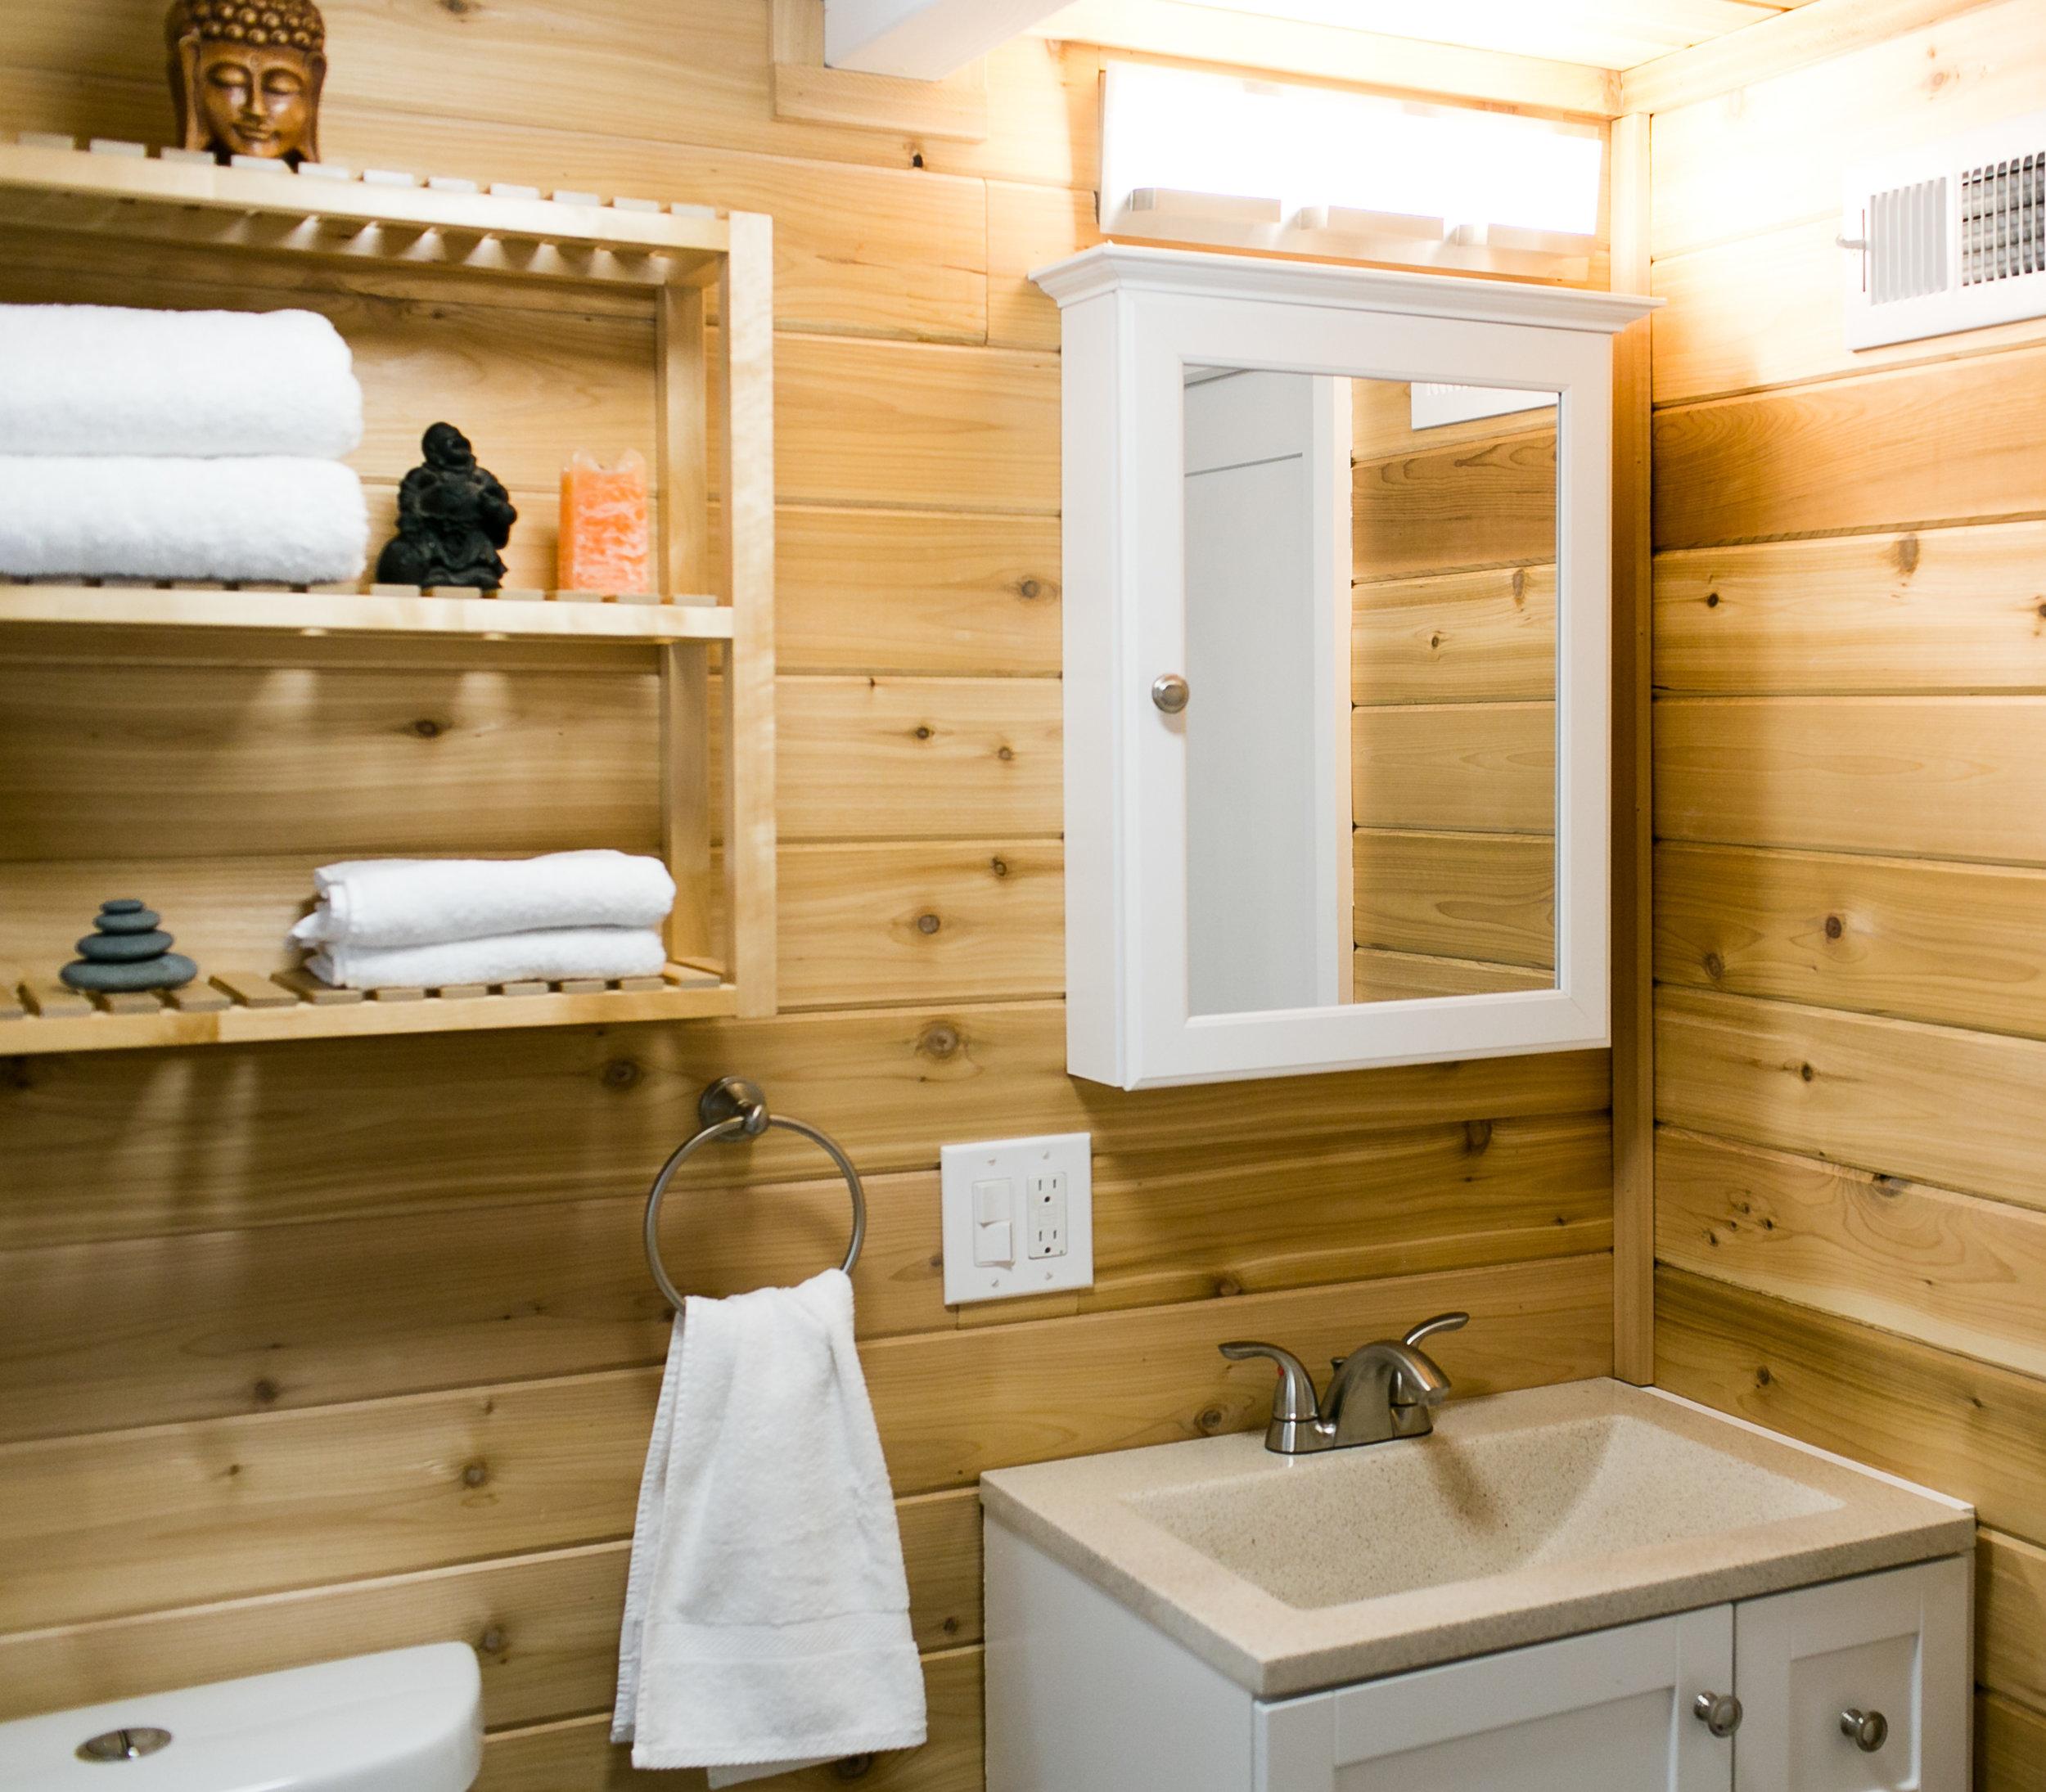 Cedar lined bathroom smells like a sauna